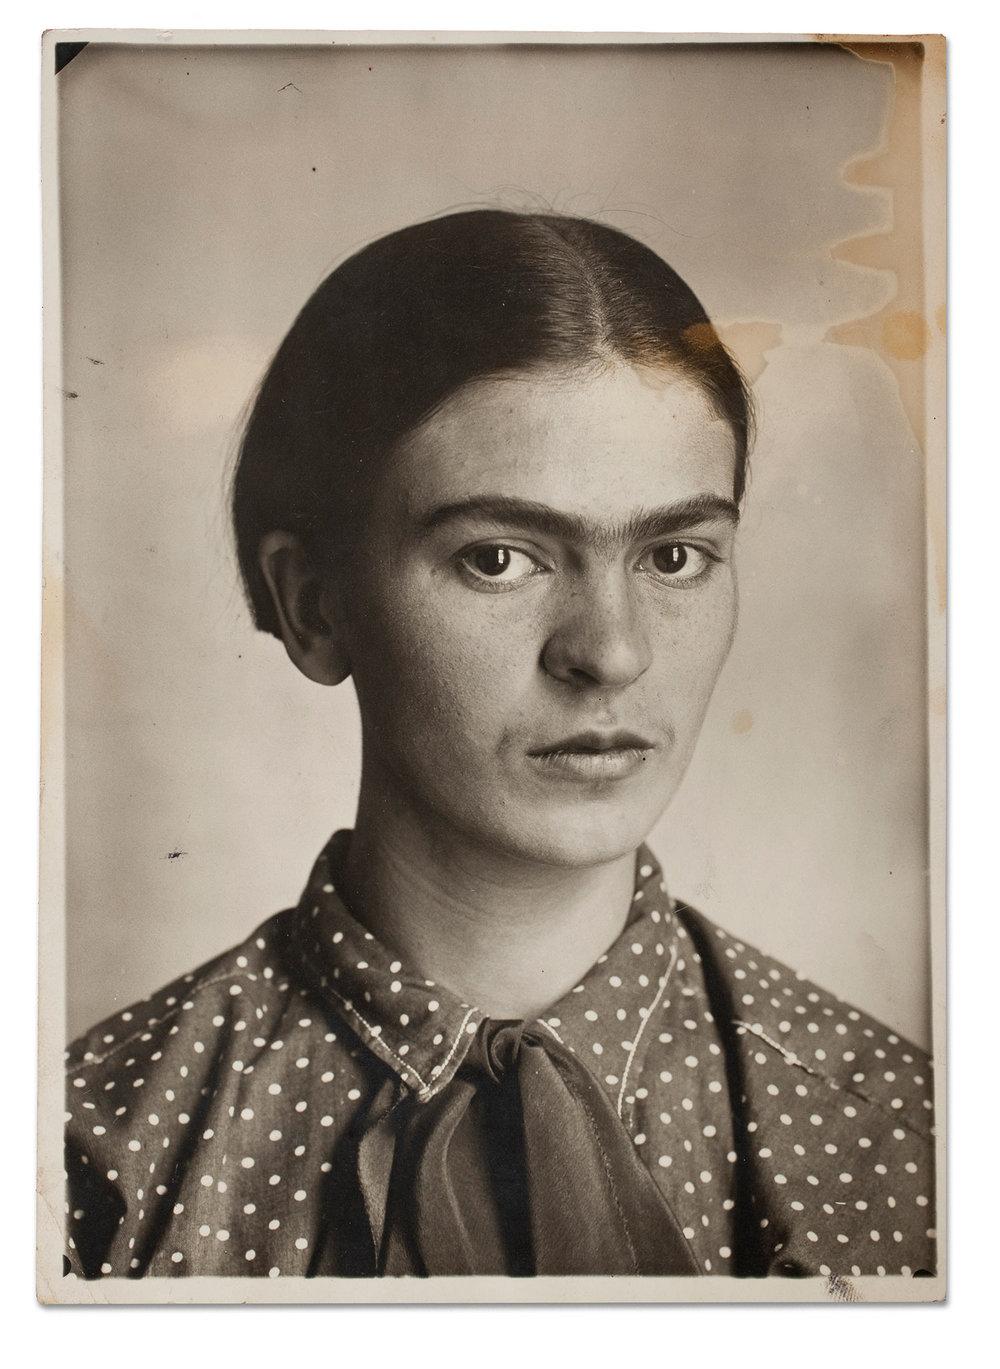 Frida Kahlo, c. 1926. Museo Frida Kahlo.© Diego Riviera and Frida Kahlo Archives, Banco de México, Fiduciary of the Trust of the Diego Riviera and Frida Kahlo Museums.